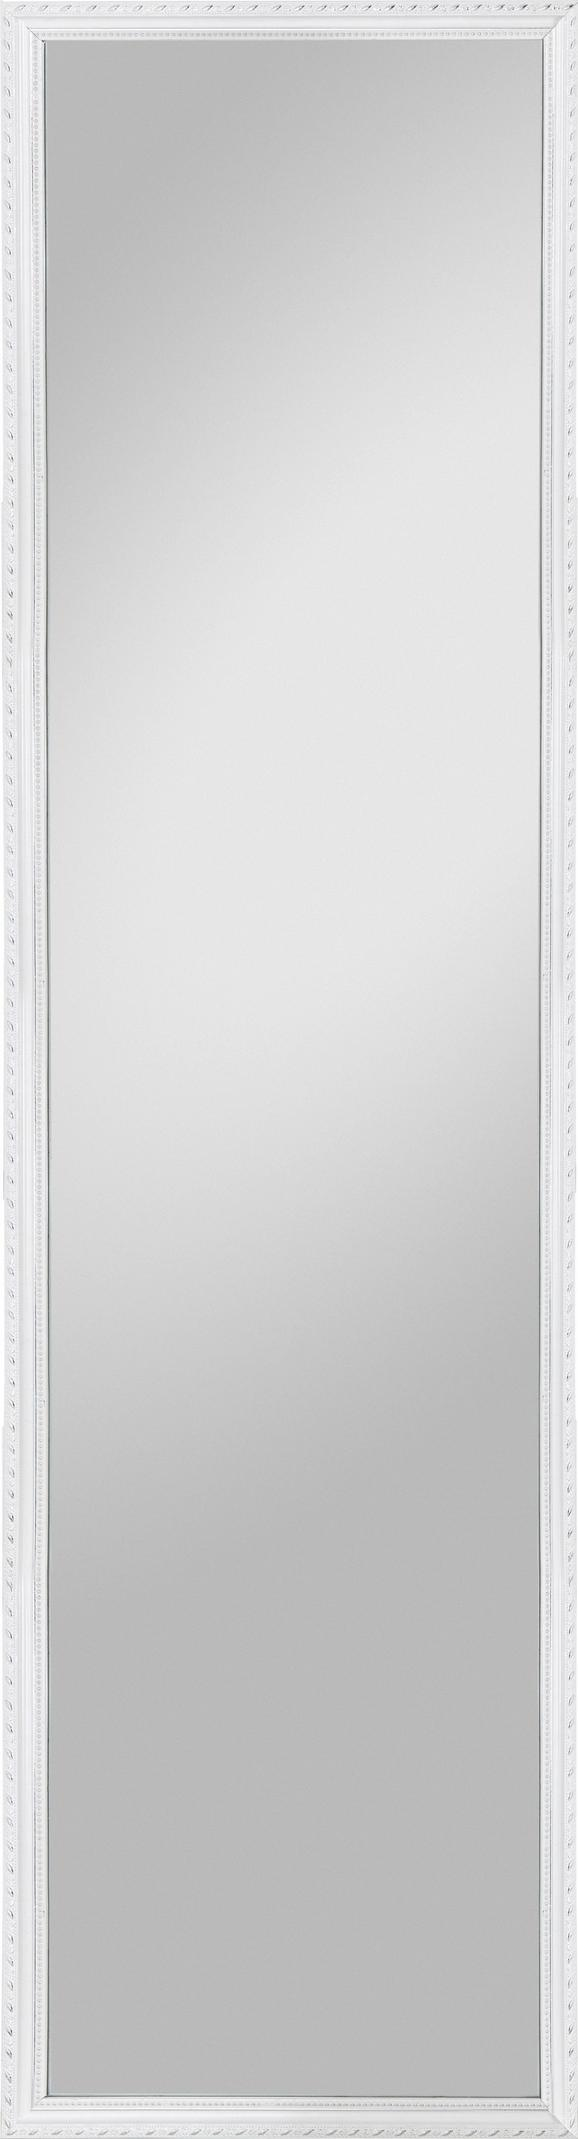 Wandspiegel Weiß - Weiß, LIFESTYLE, Glas/Holz (30/120/2,3cm) - Mömax modern living